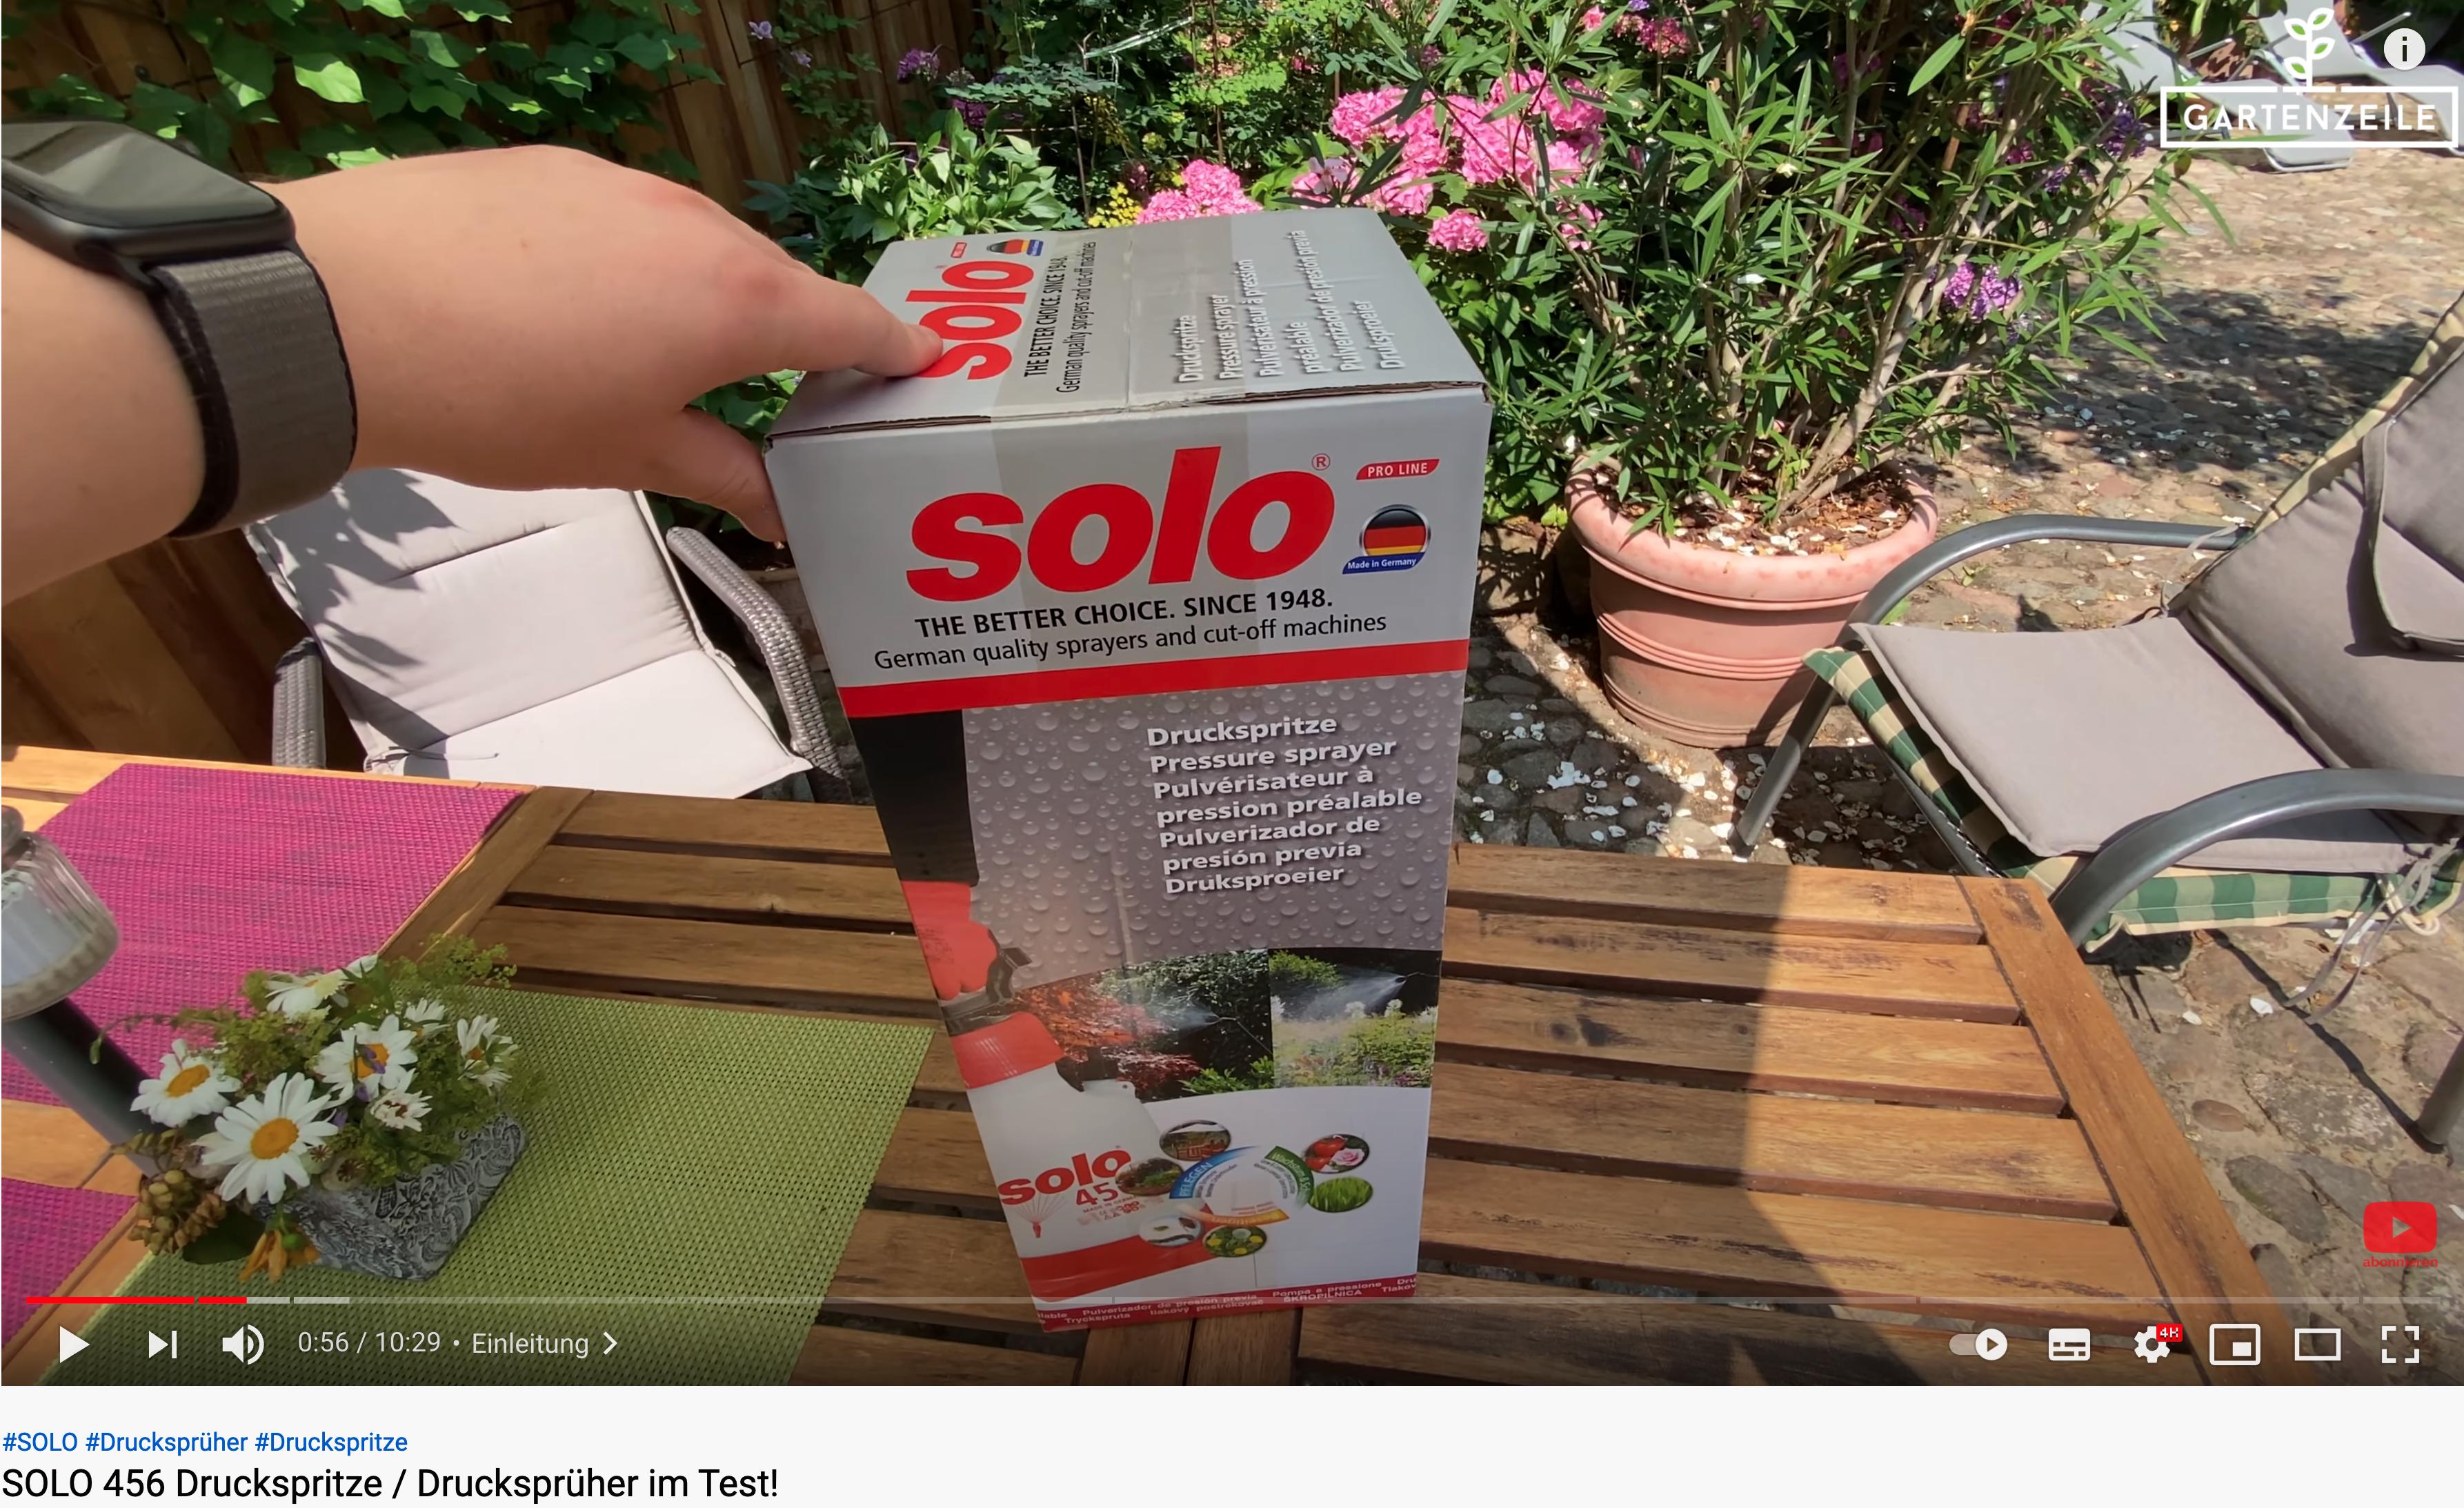 Unboxing SOLO 456 Drucksprüher